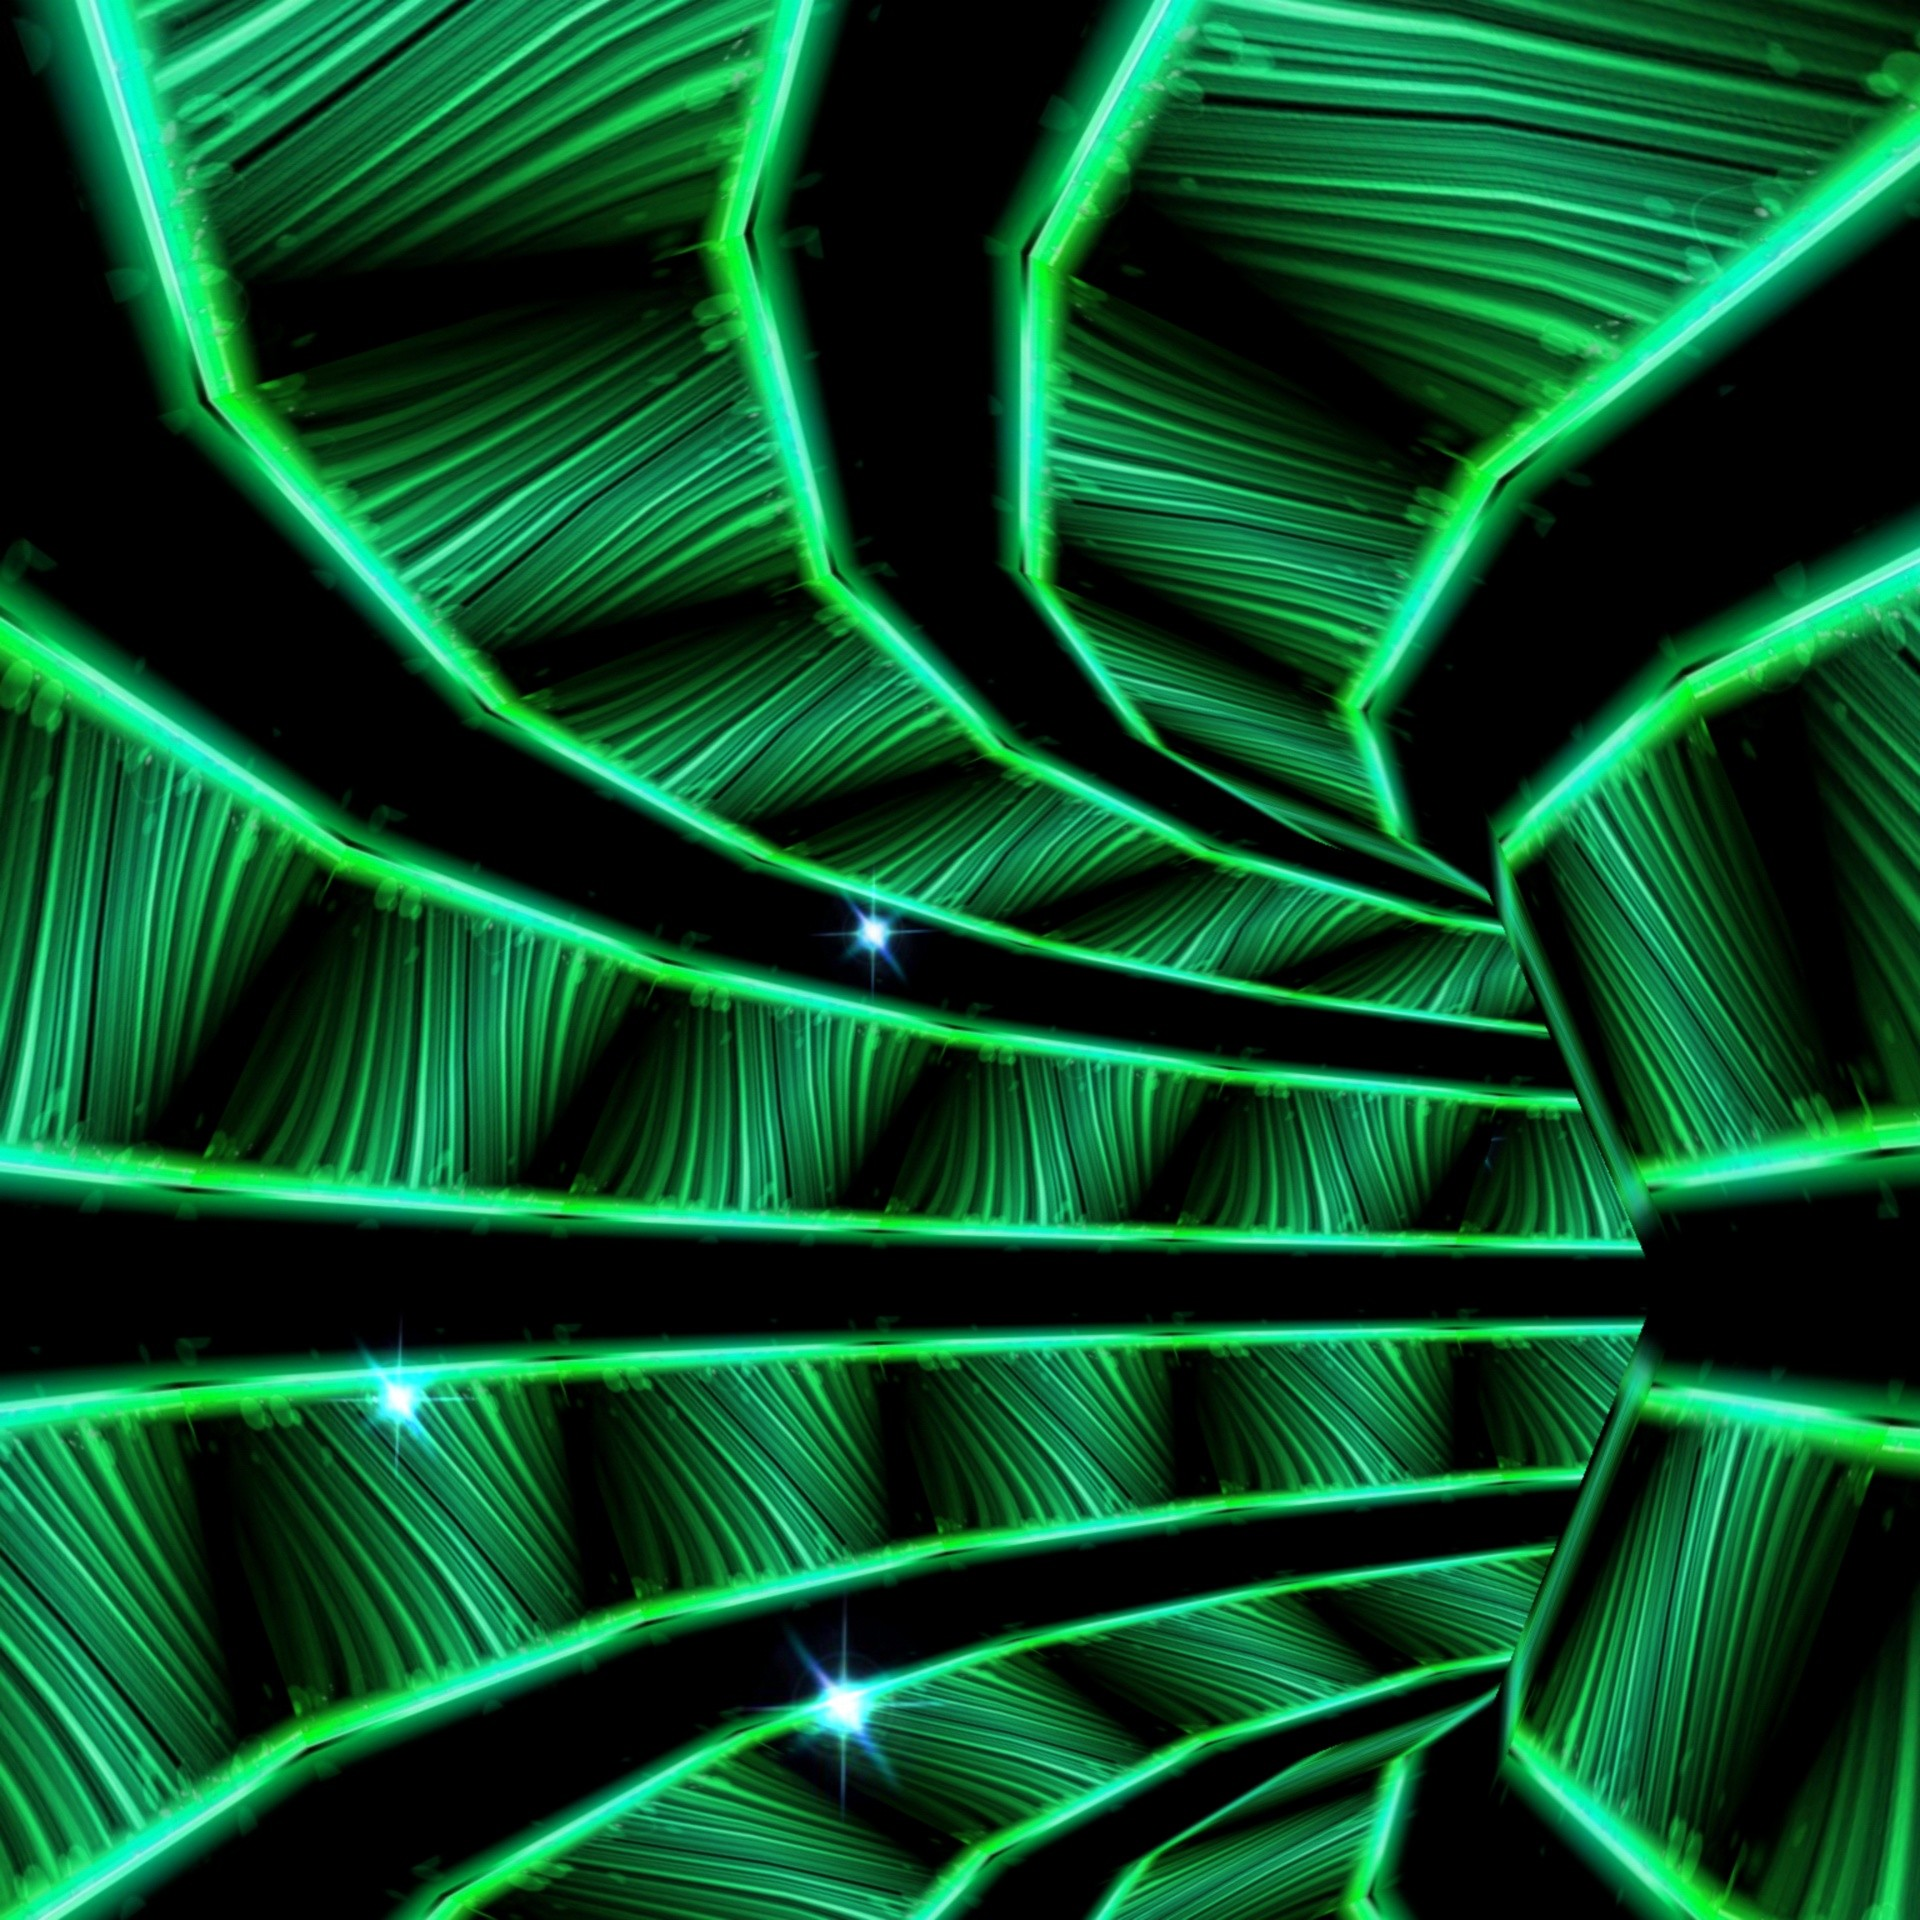 Green Neon Wallpaper (83+ Images